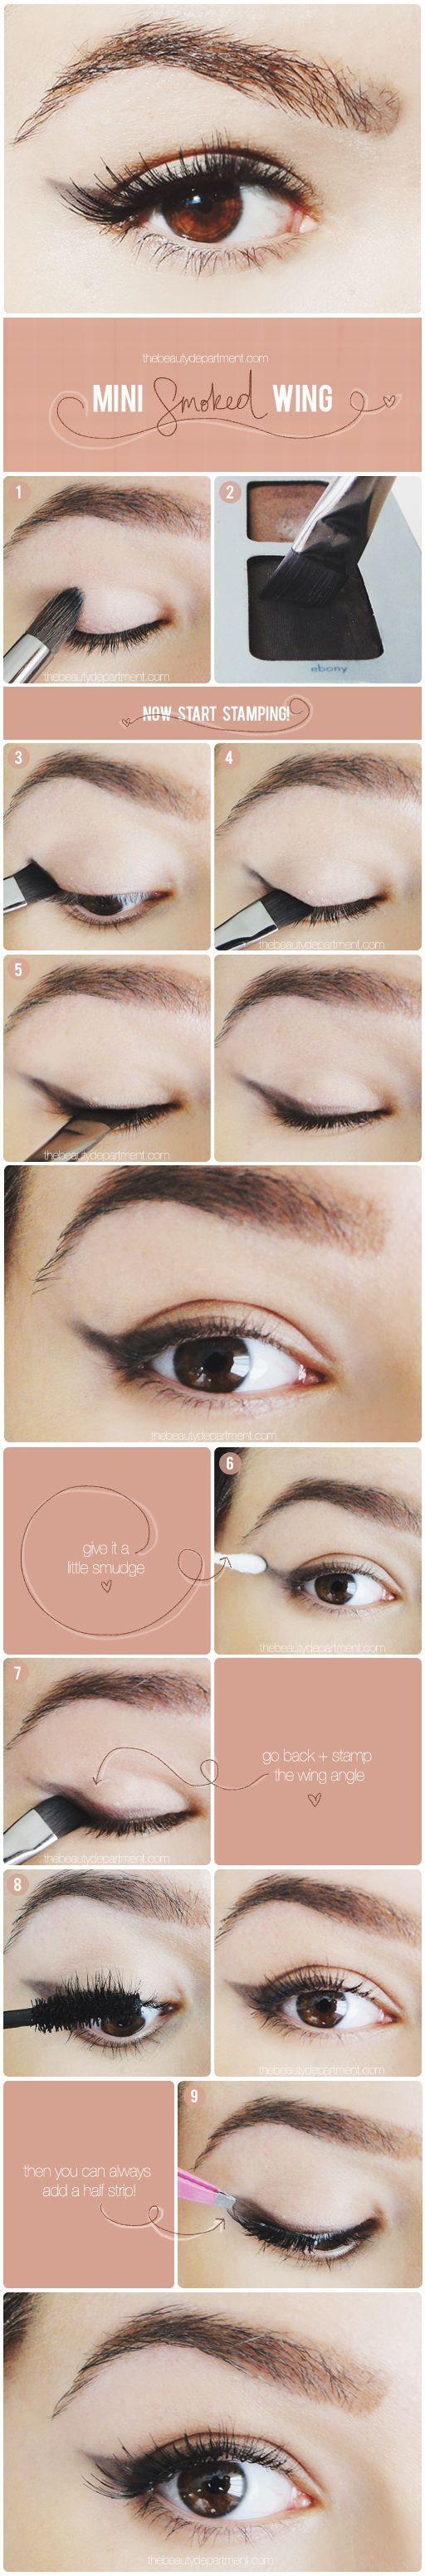 Mariage - Smudged Eyeliner Tutorial